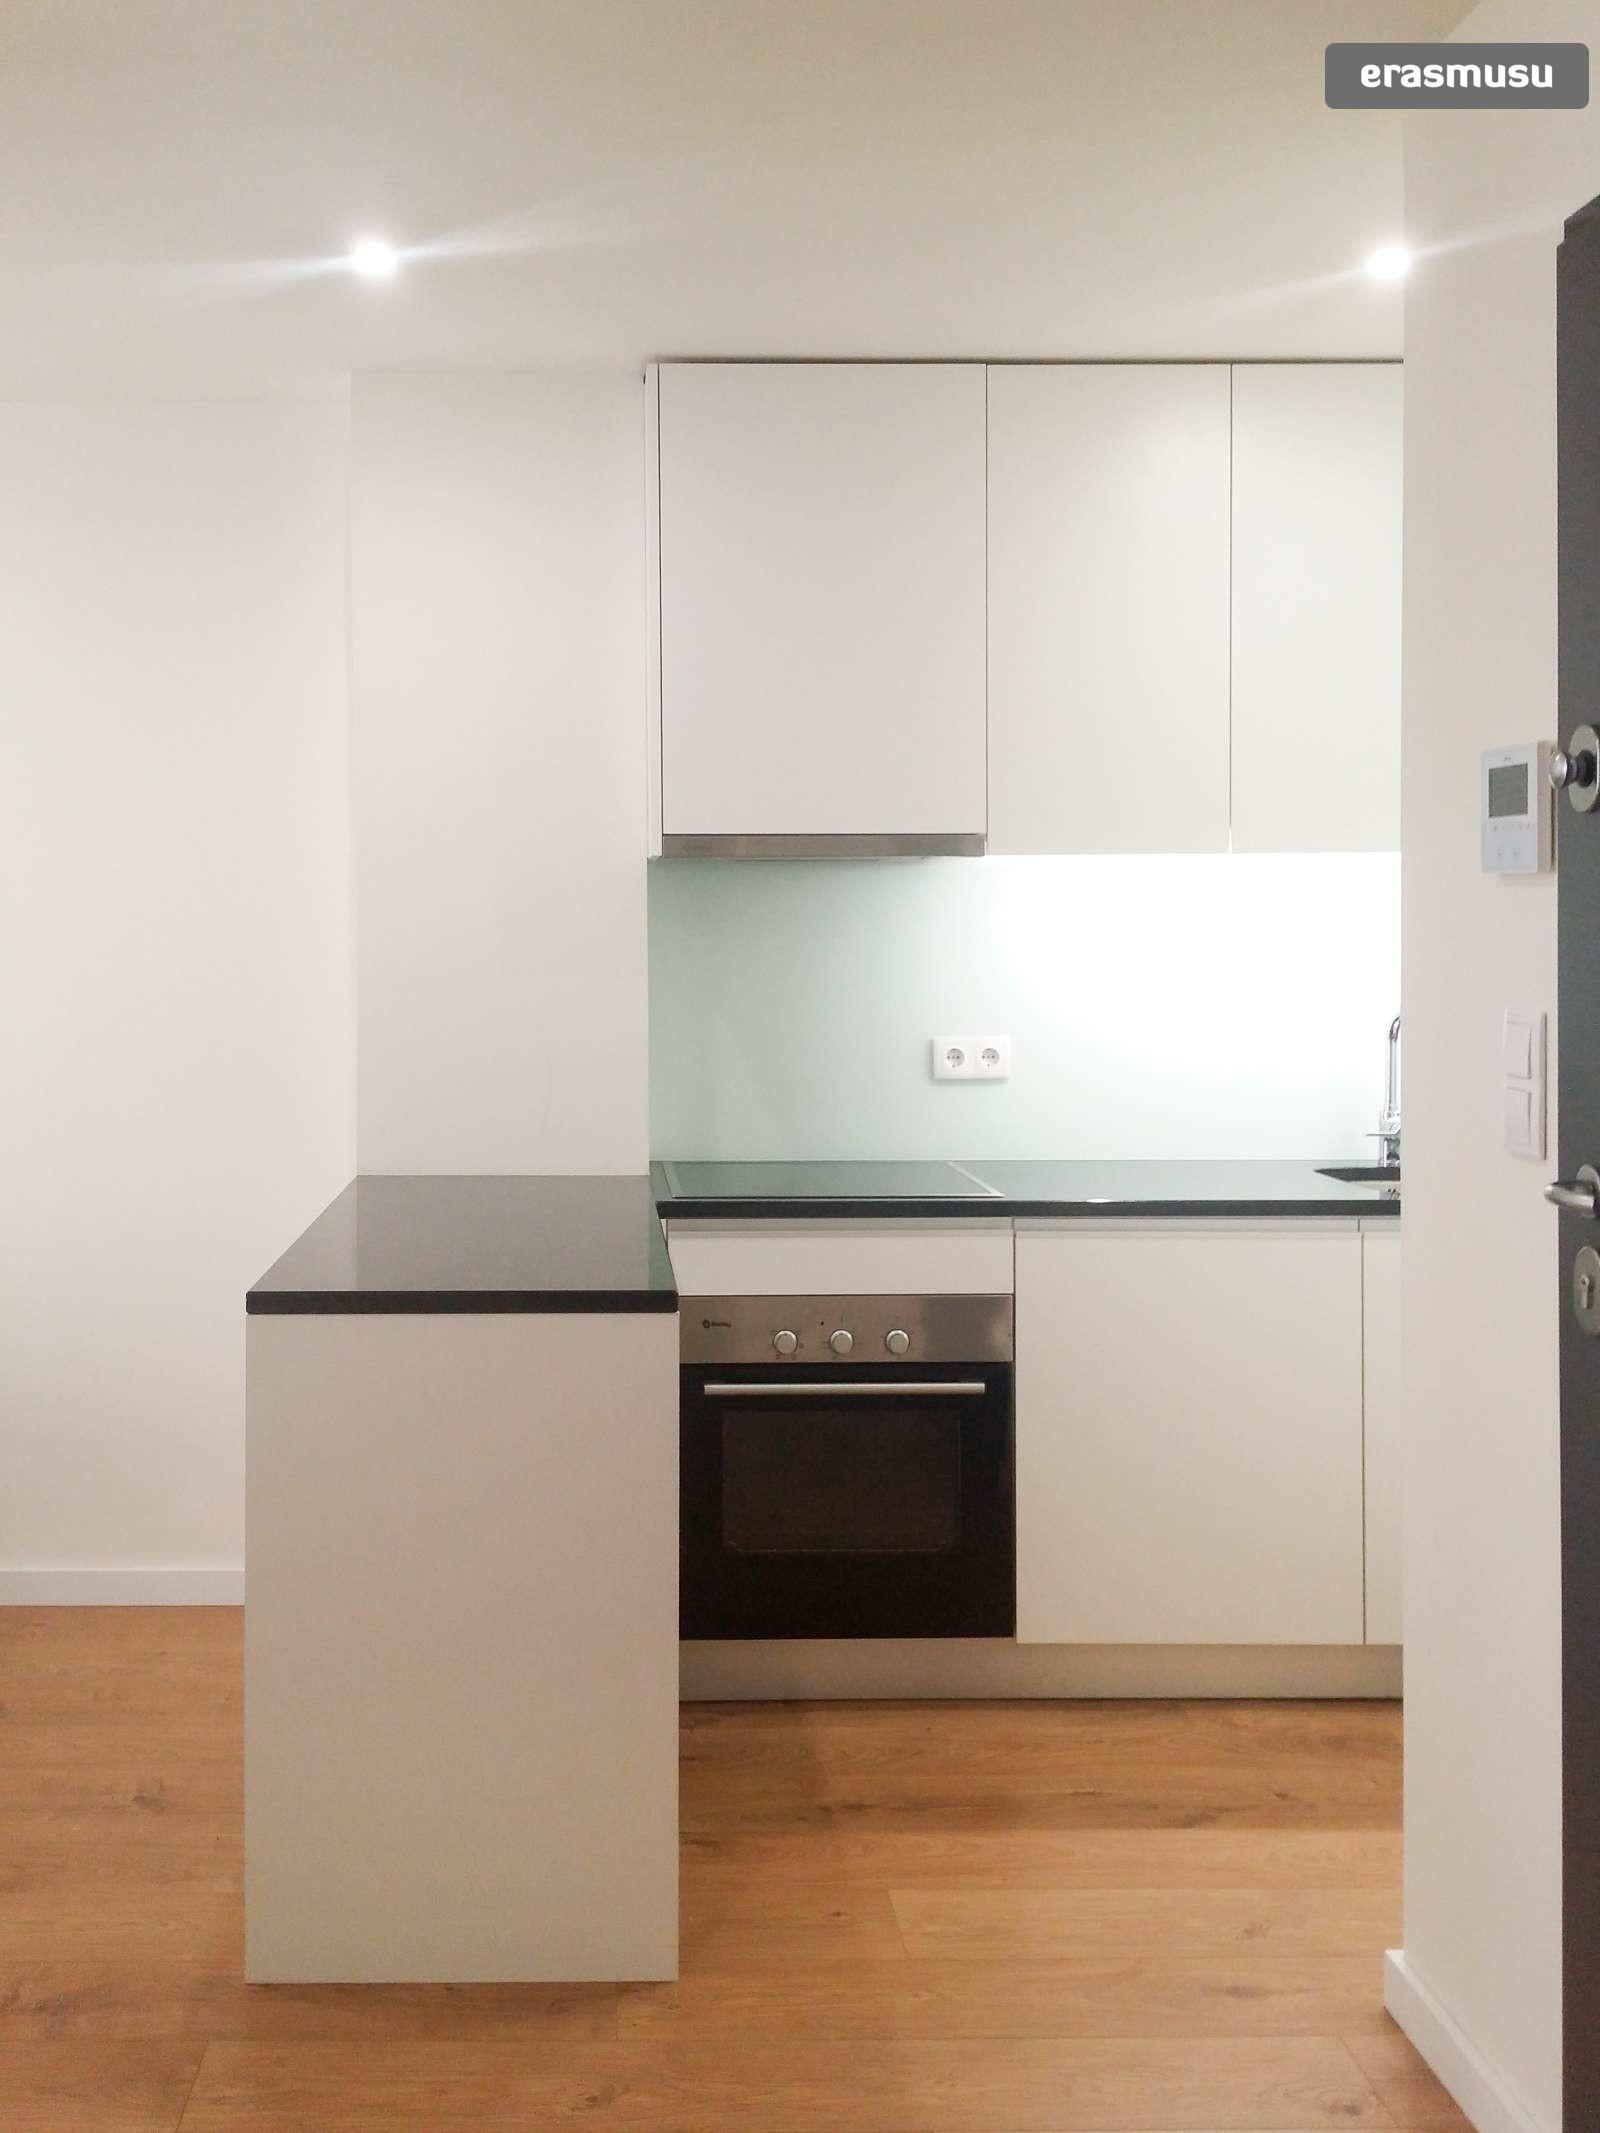 1-bedroom-apartment-rent-santo-ildefonso-e3b6ace94b27ecefc8e41eb